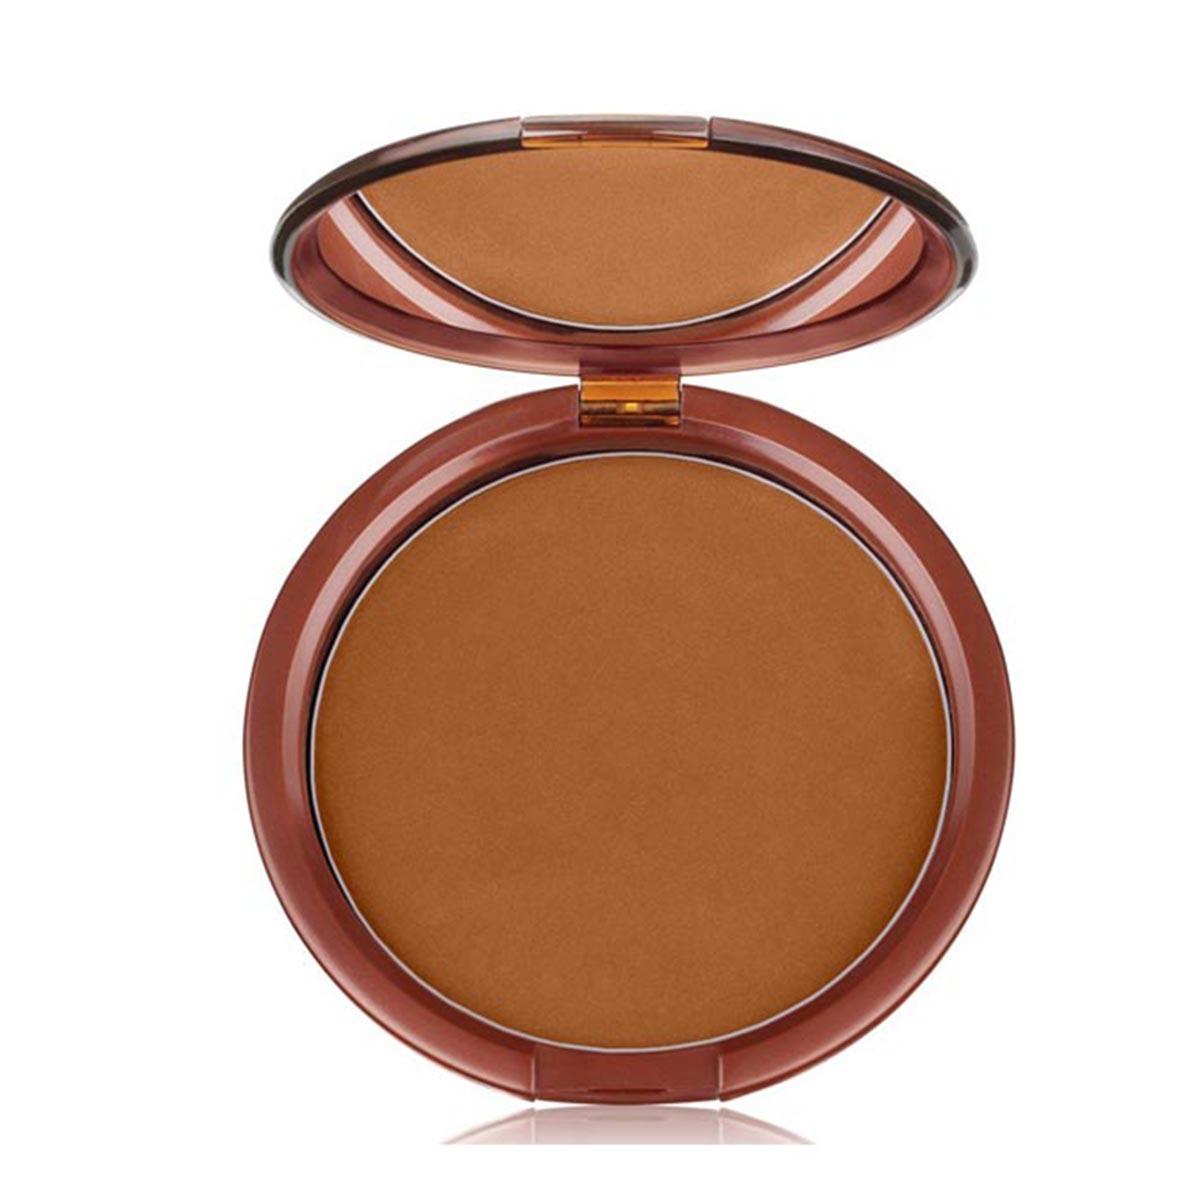 Estee lauder maquillaje powder bronzer medium deep 03